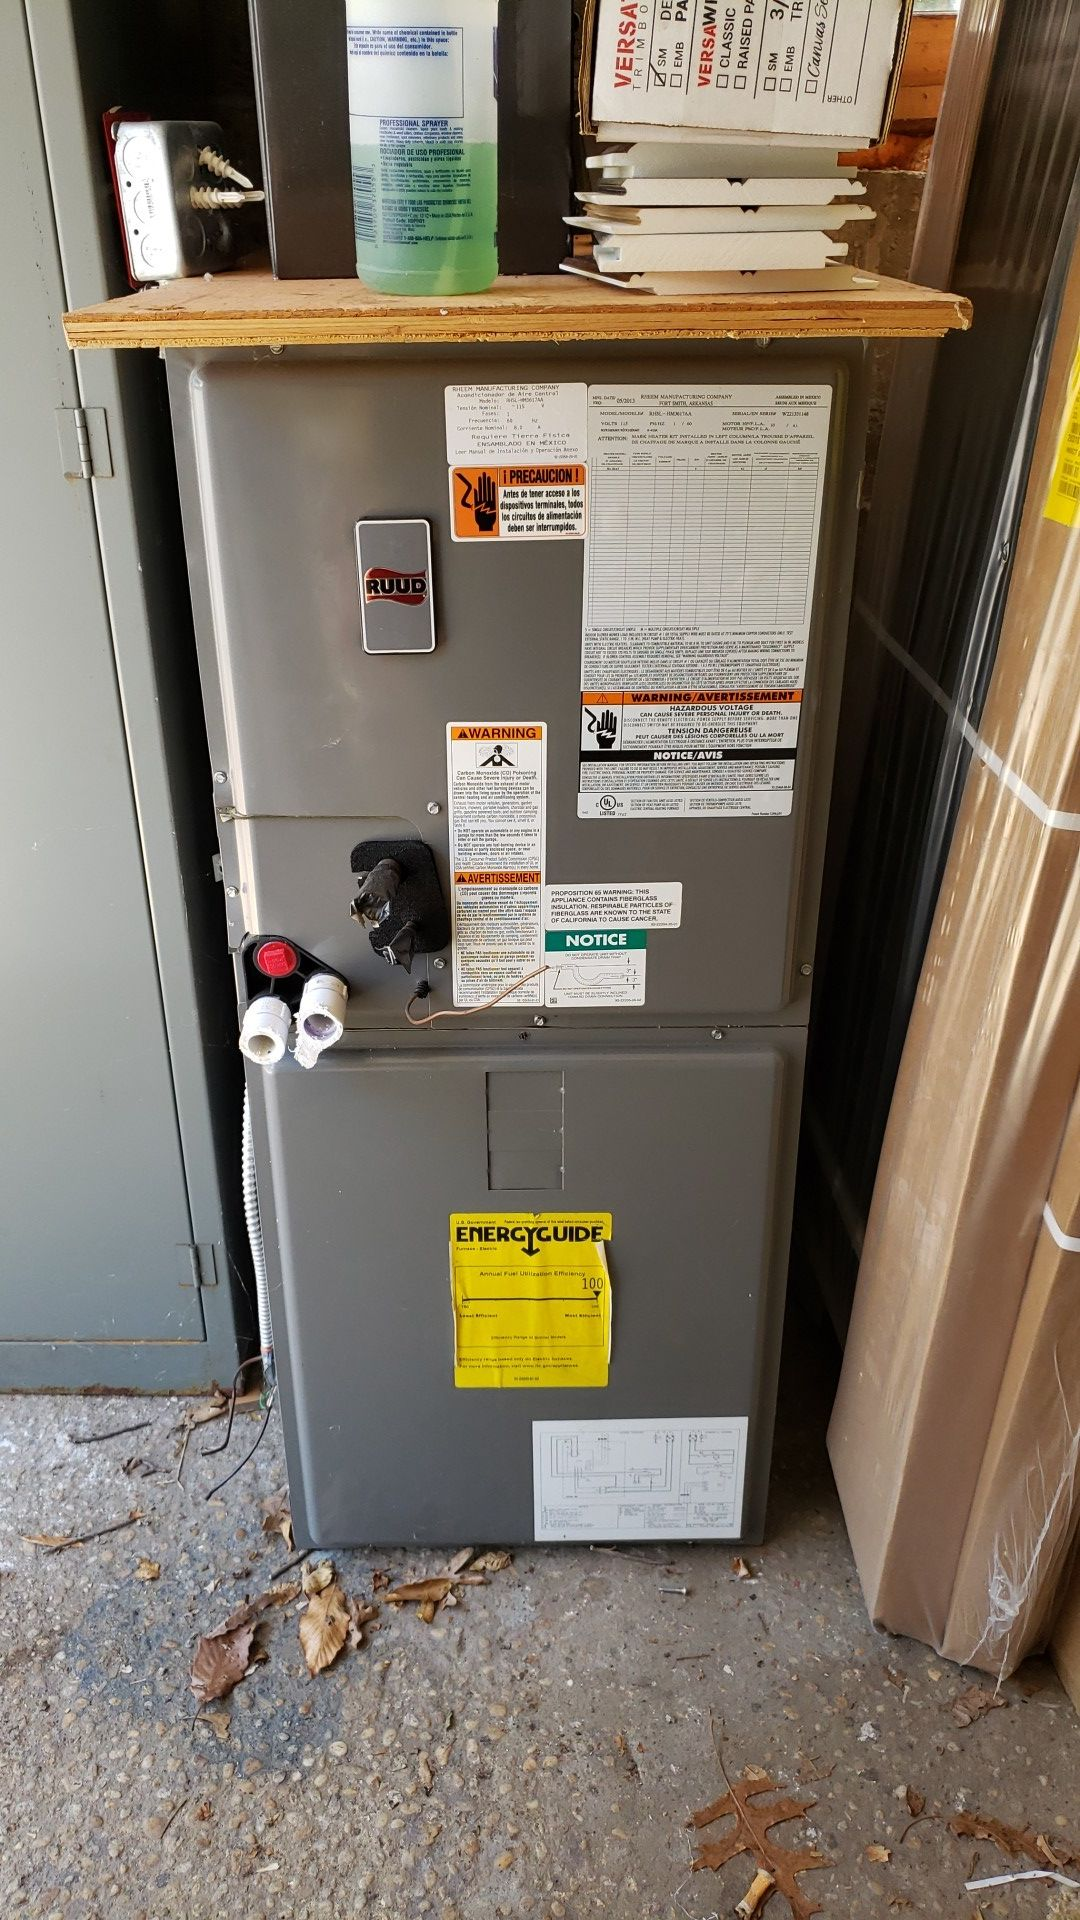 A/C unit with 3 1/2 ton condenser